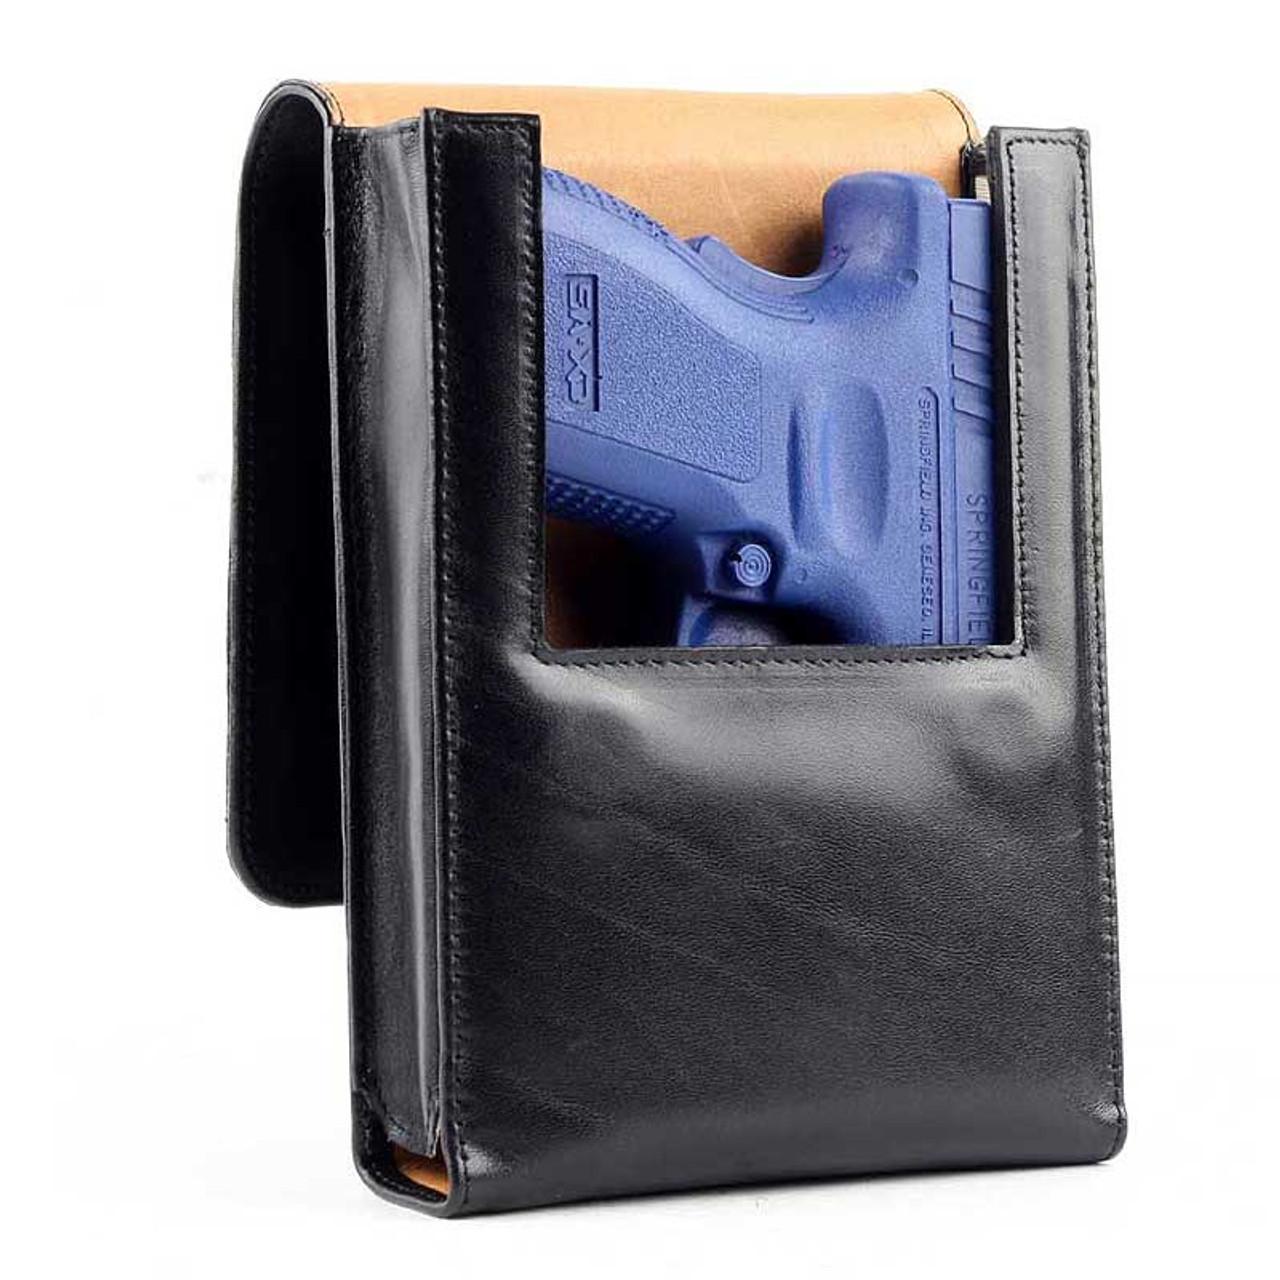 Springfield XD9sc Concealed Carry Holster (Belt Loop)